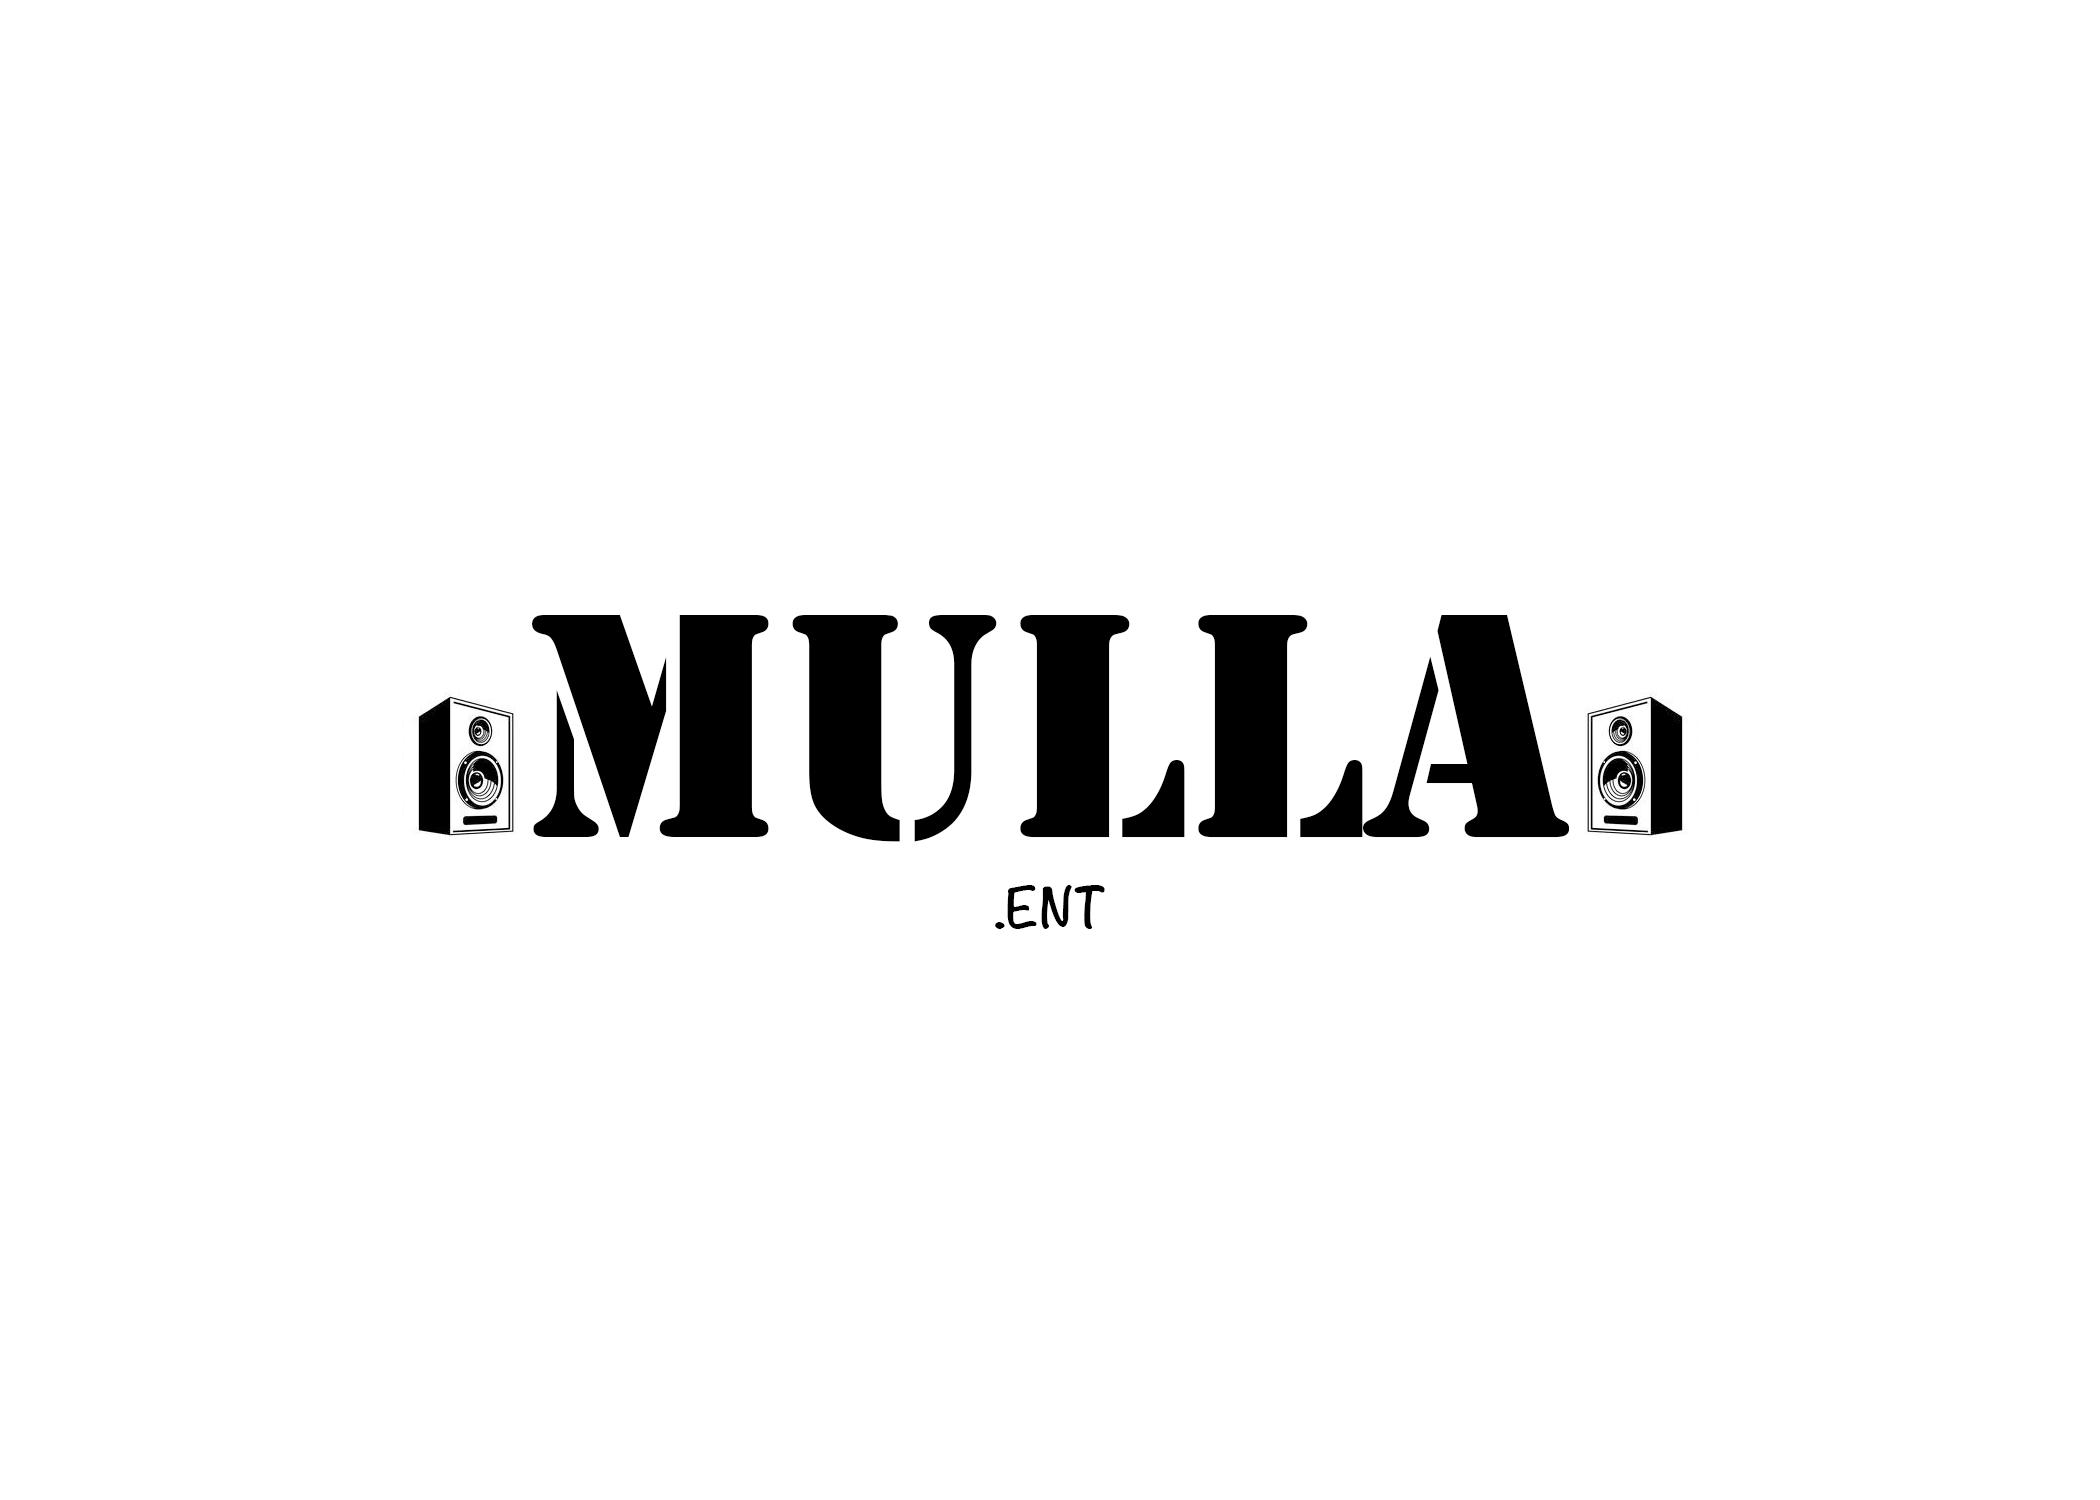 Mulla_.ent_logo